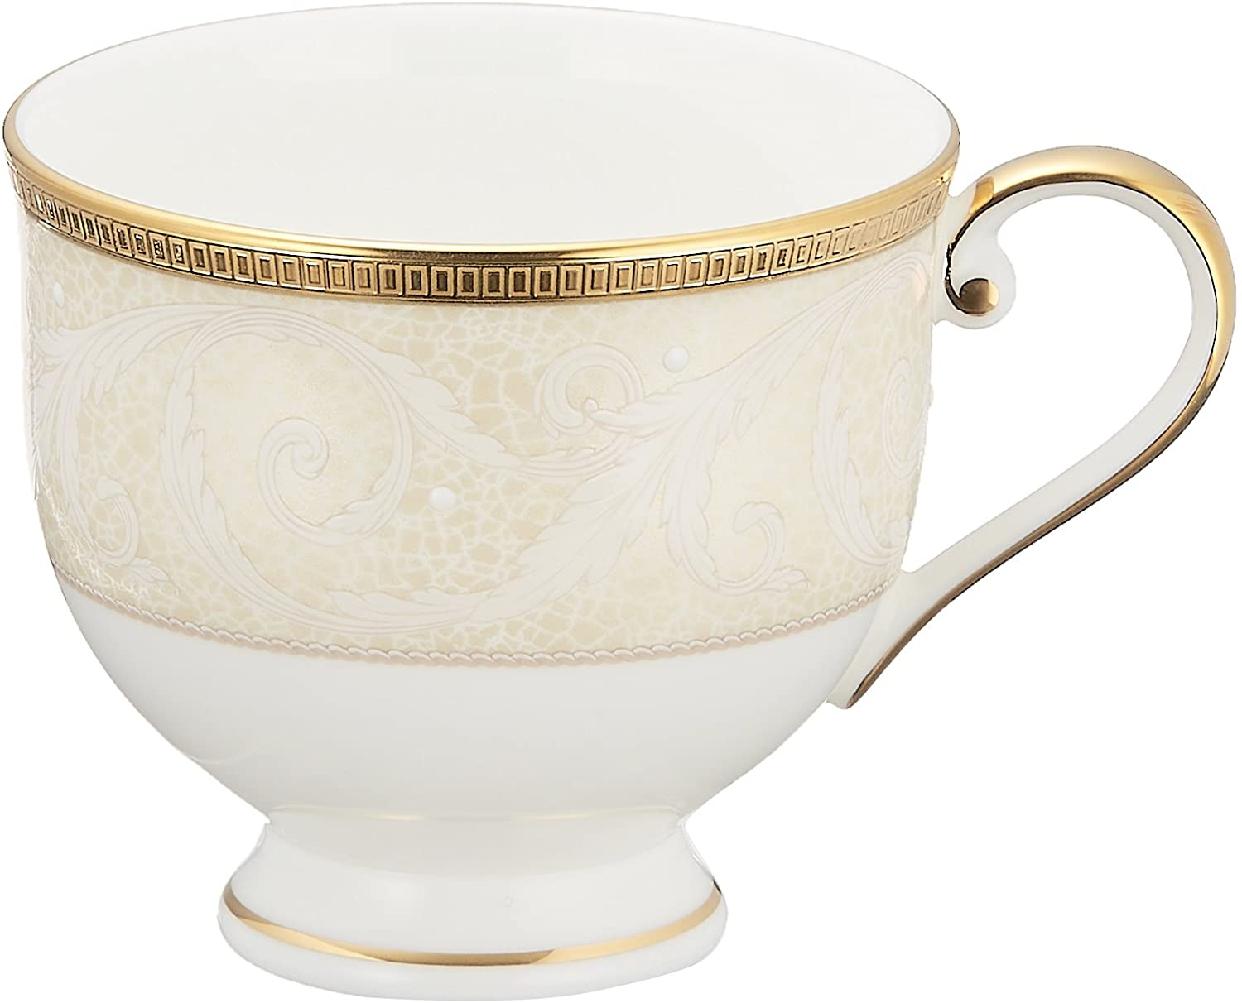 Narumi(ナルミ) エスプレッソカップ 51035-2427の商品画像